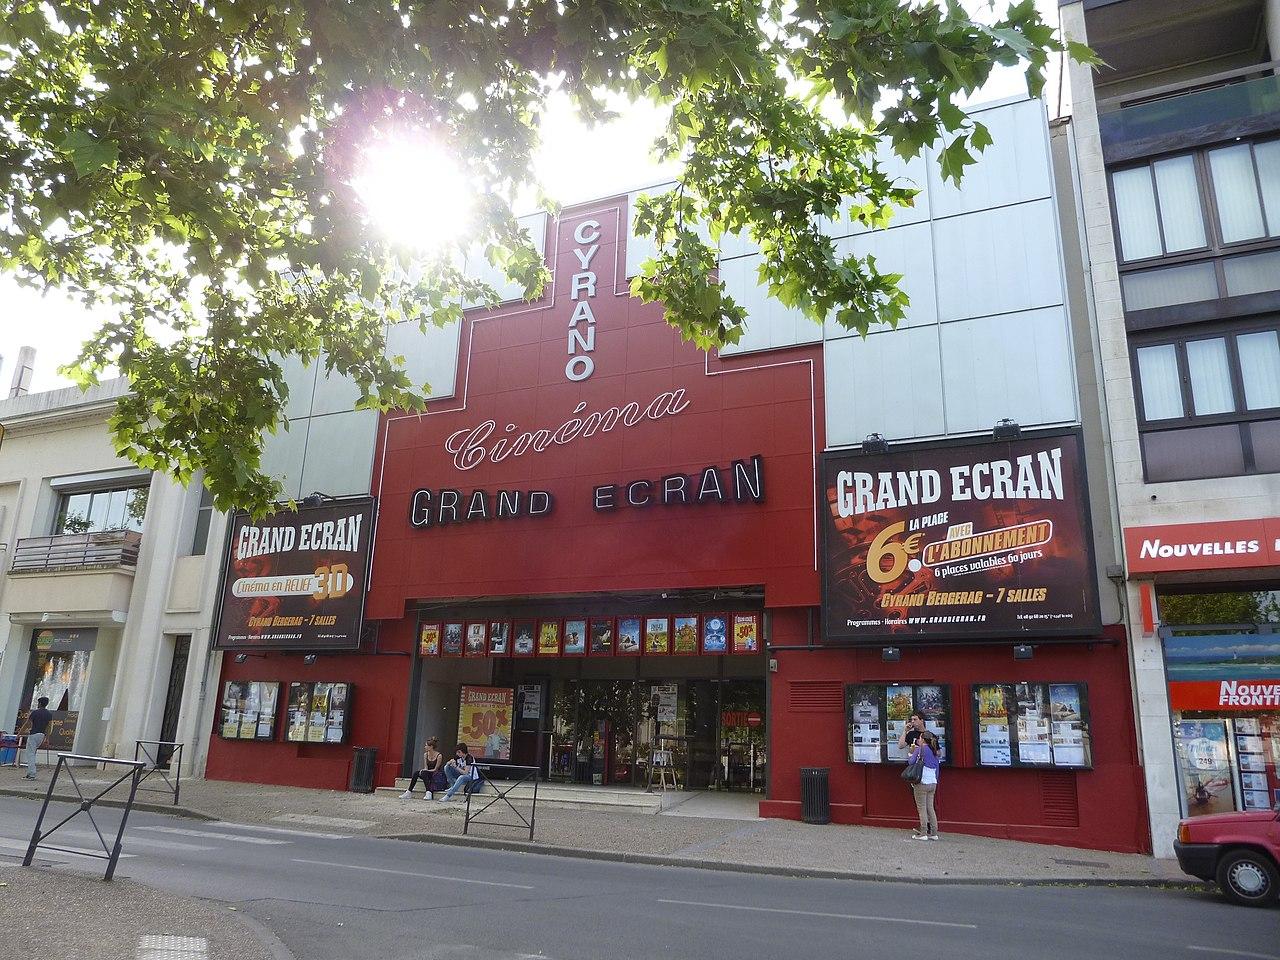 Fichier:Cinéma Grand Ecran Bergerac.jpg — Wikipédia